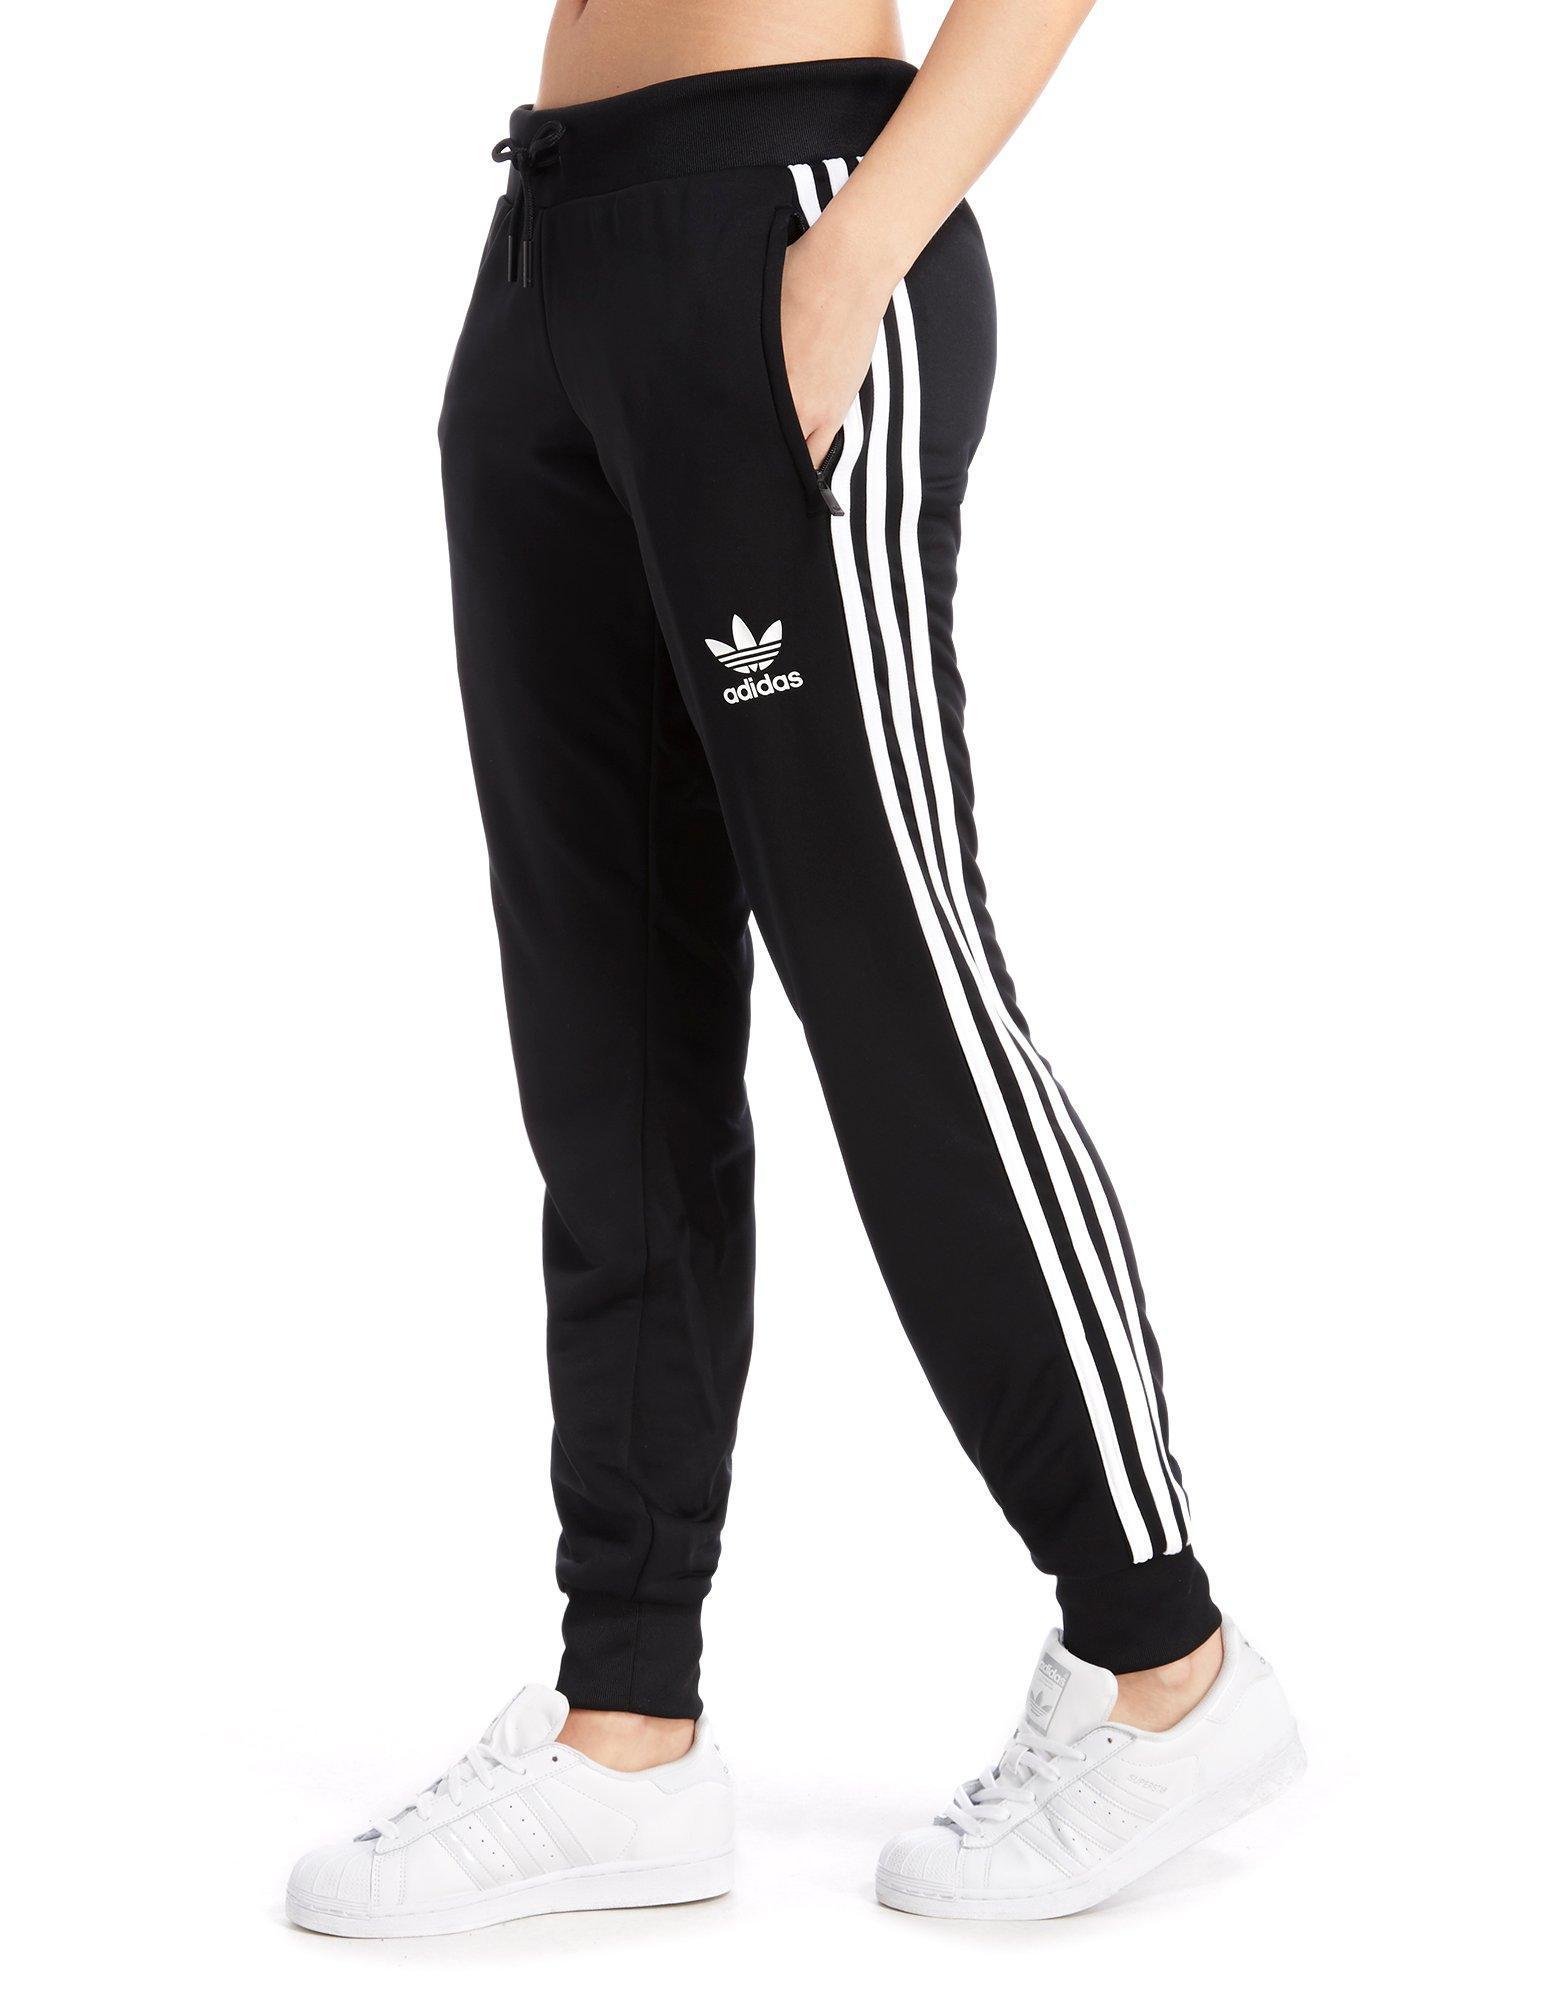 f7f534a6fb693 adidas Originals Poly 3-stripes Pants in Black - Lyst